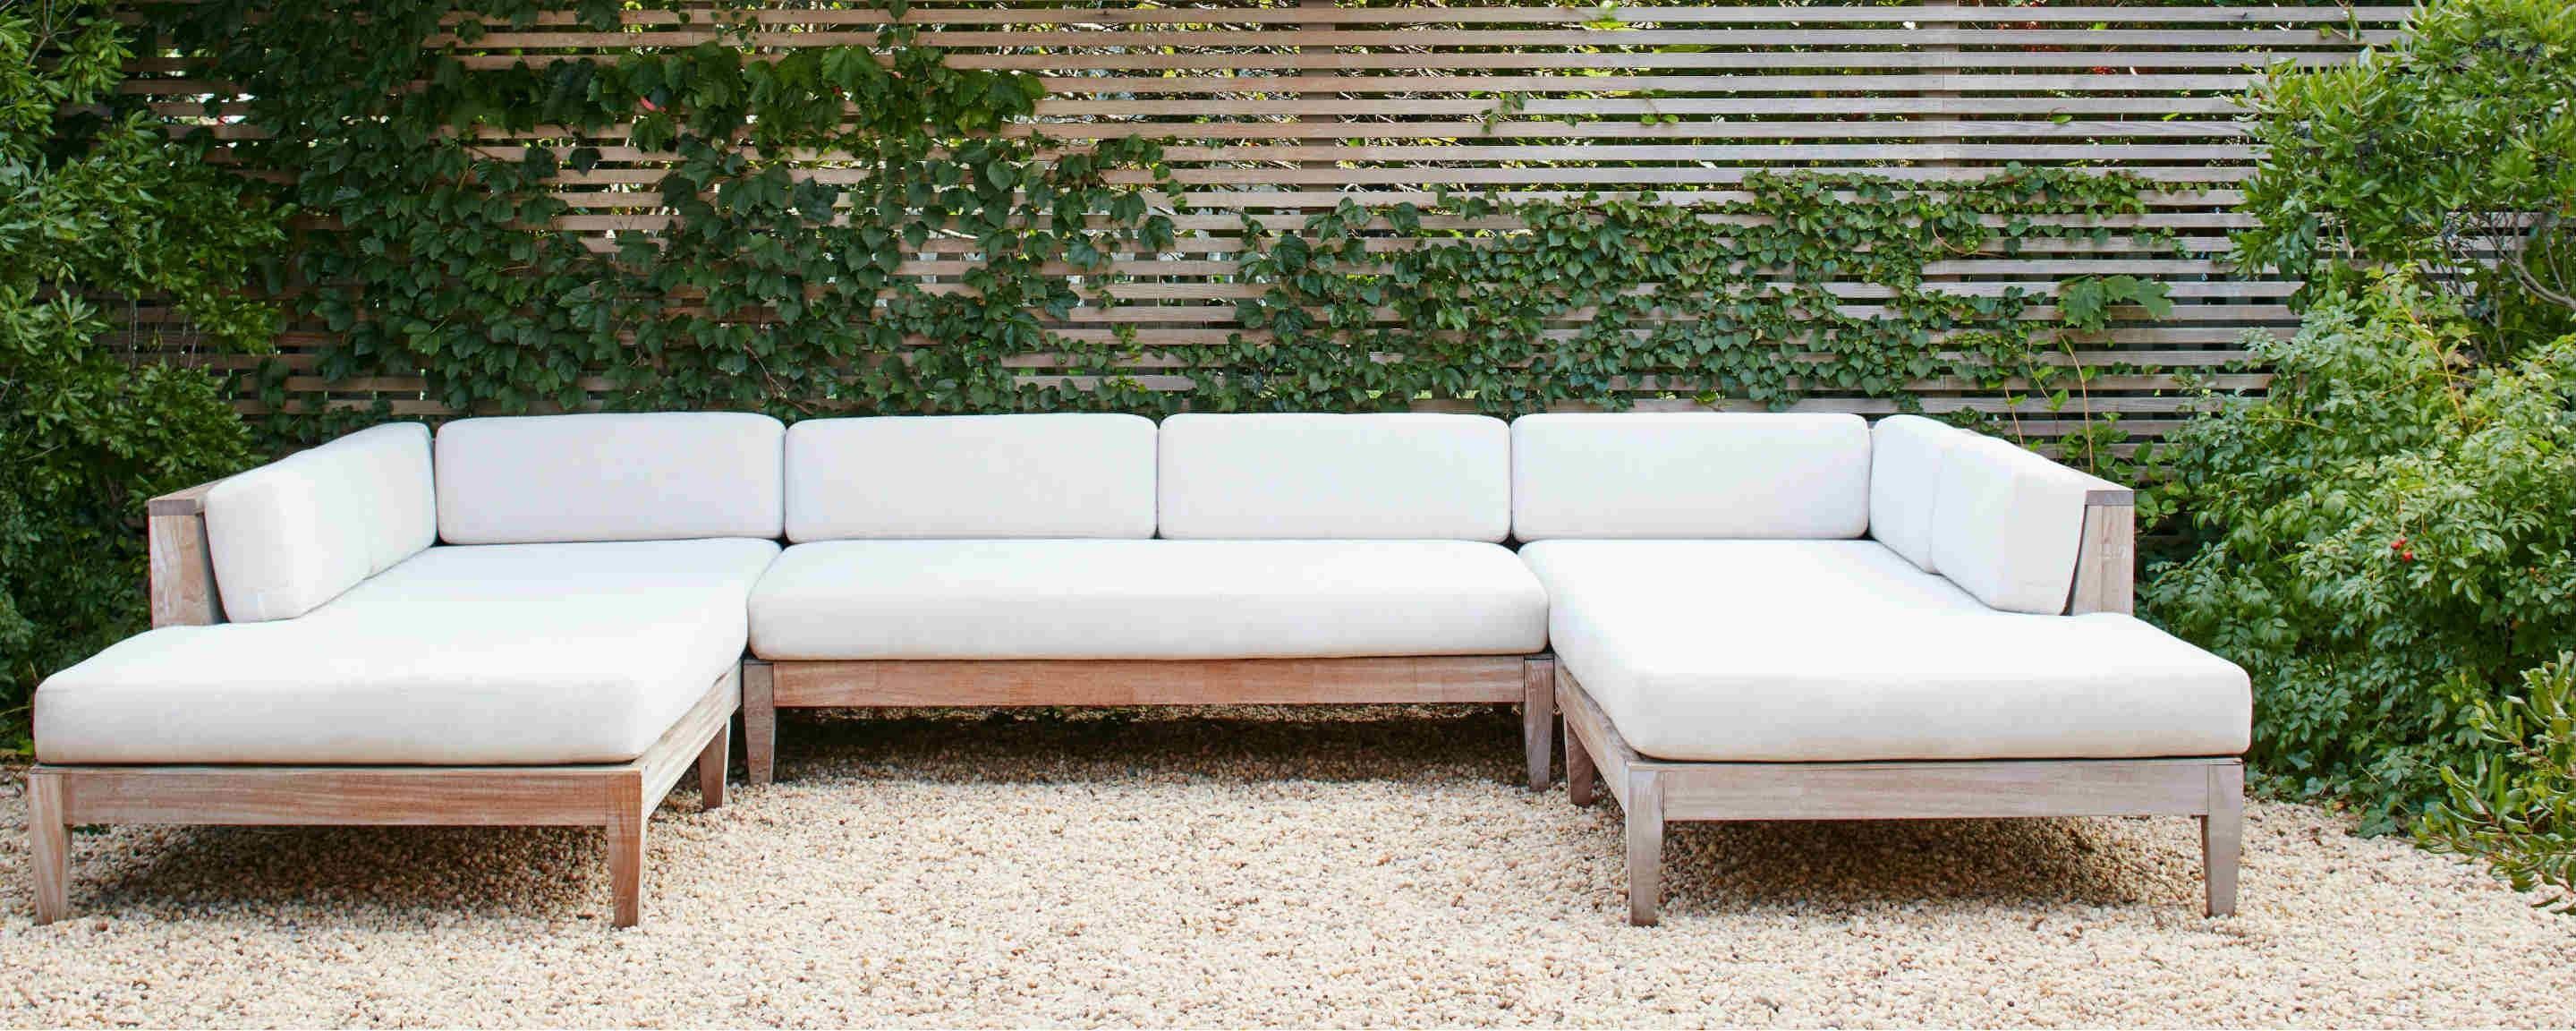 sapele wood outdoor sectional sofa